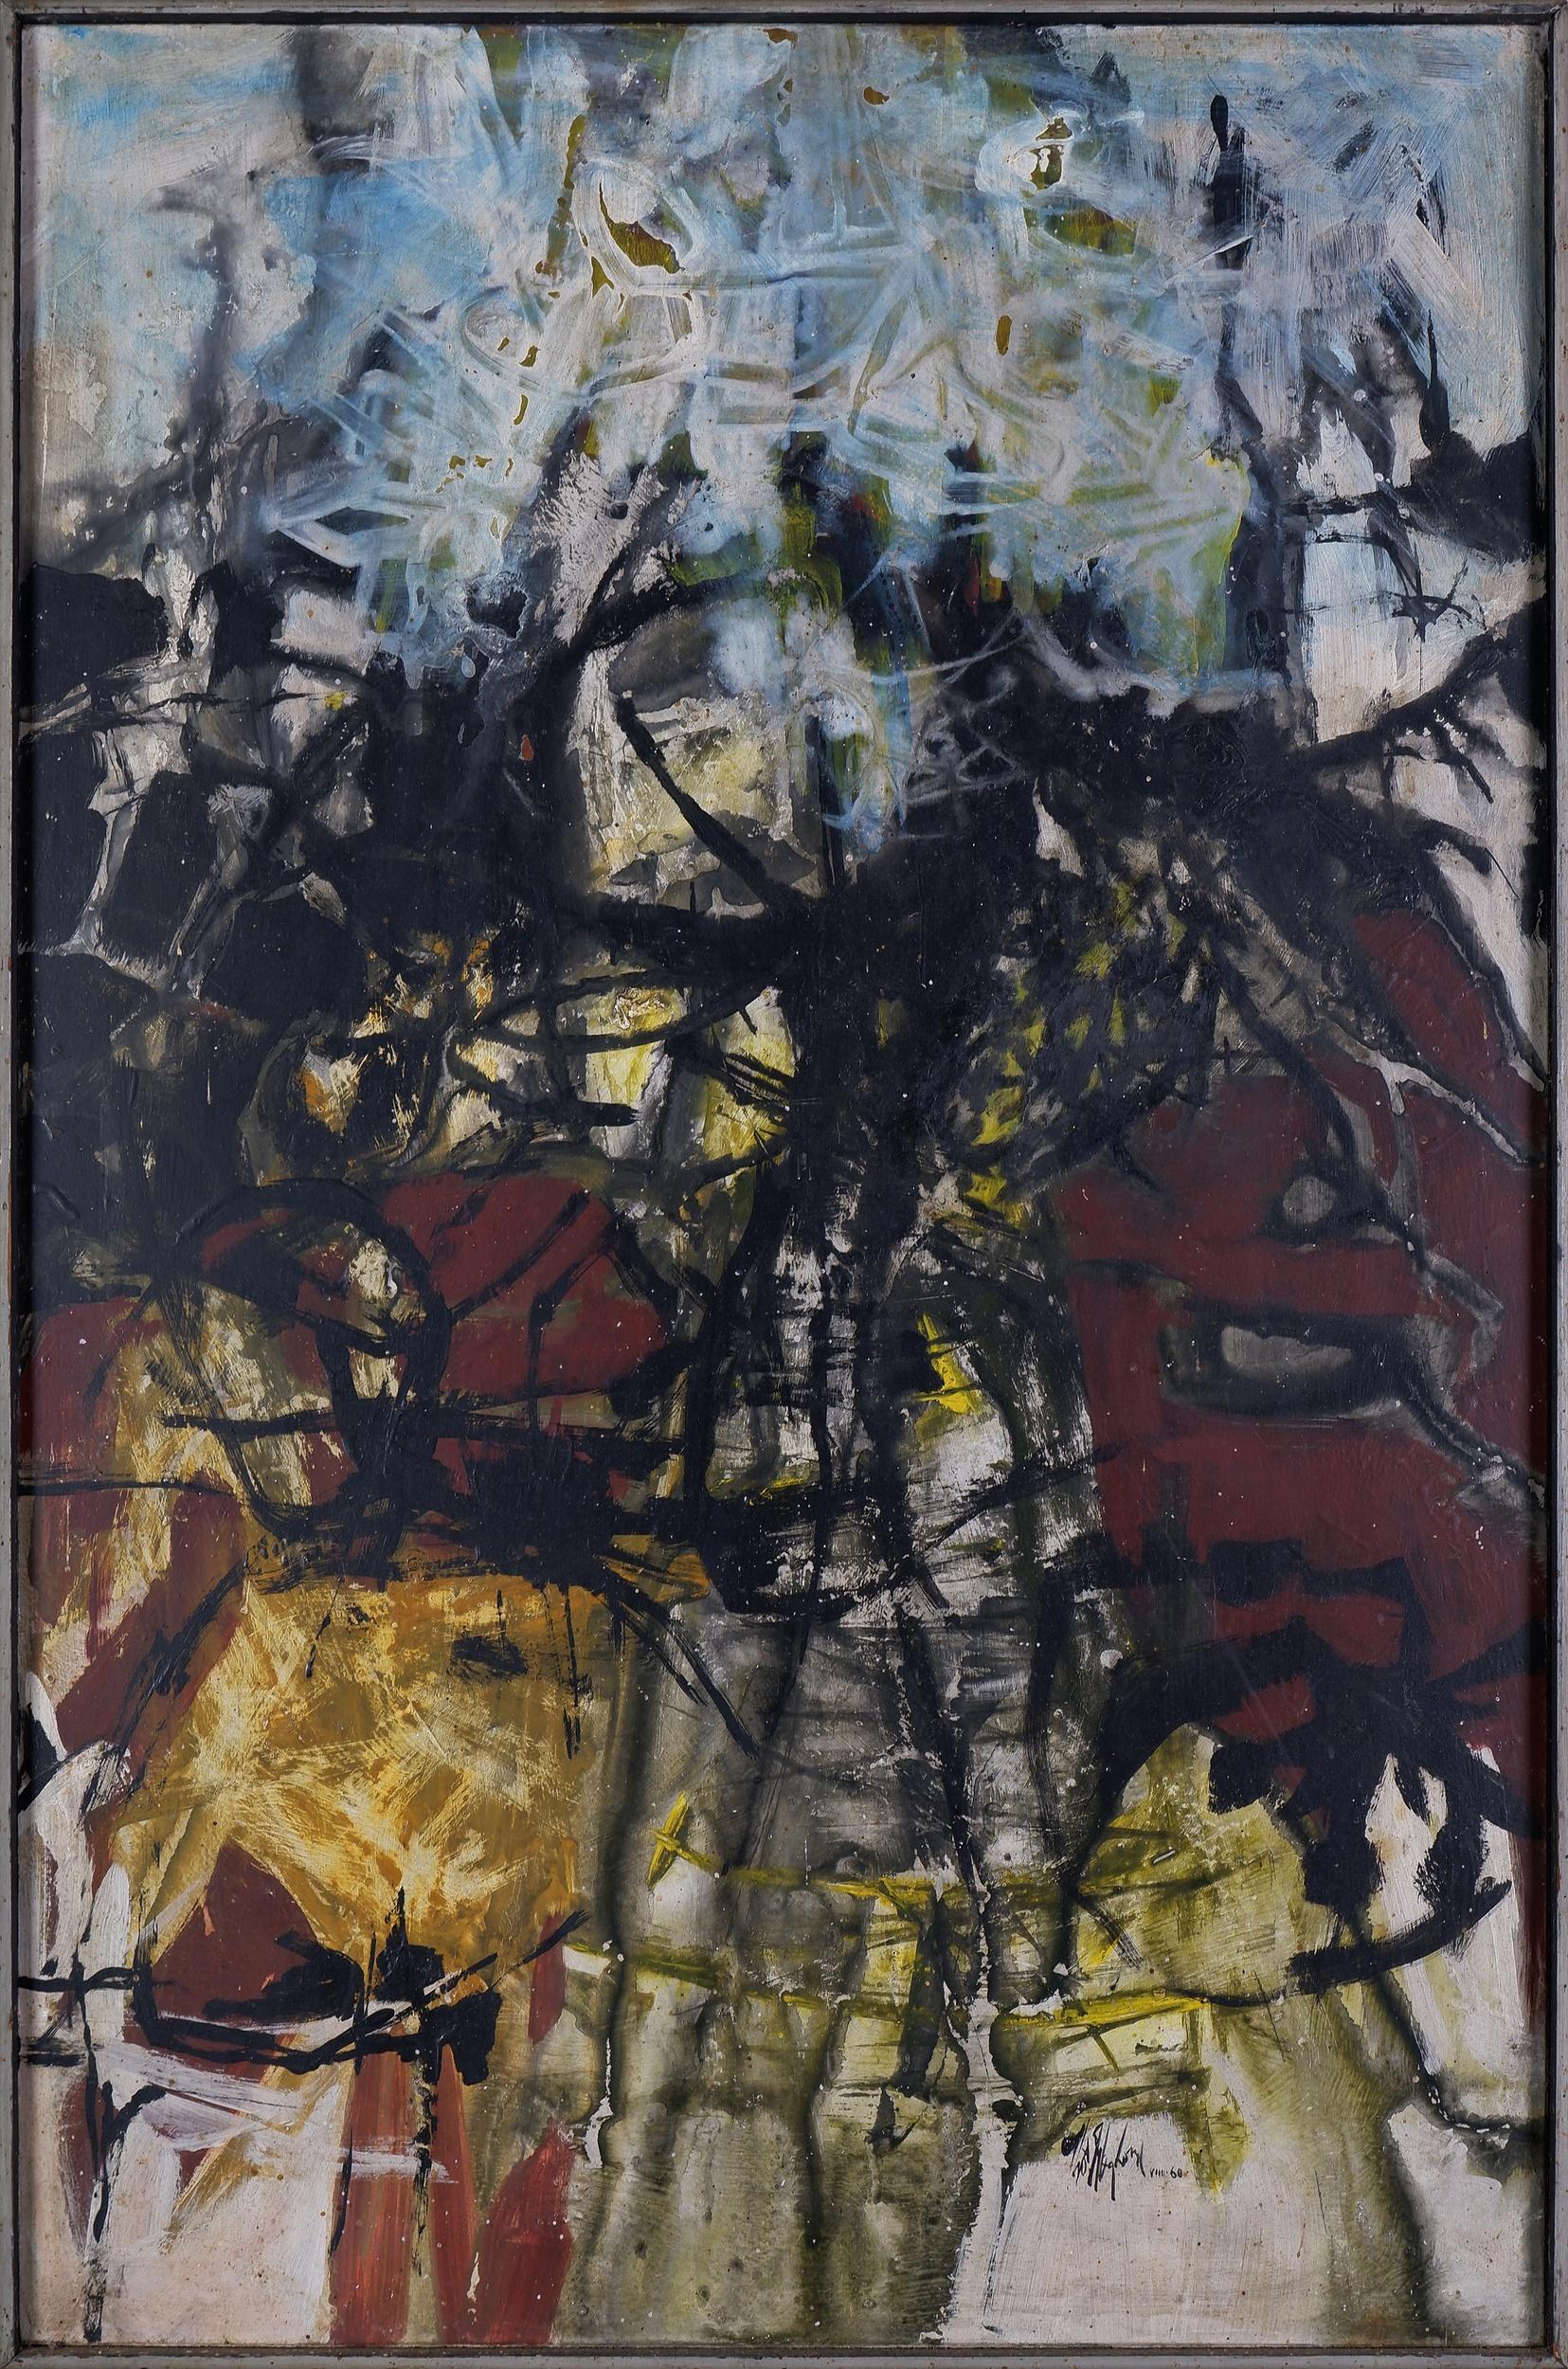 'Thomas Gleghorn (born 1925), Between Two Seasons 1960, Oil on Board'